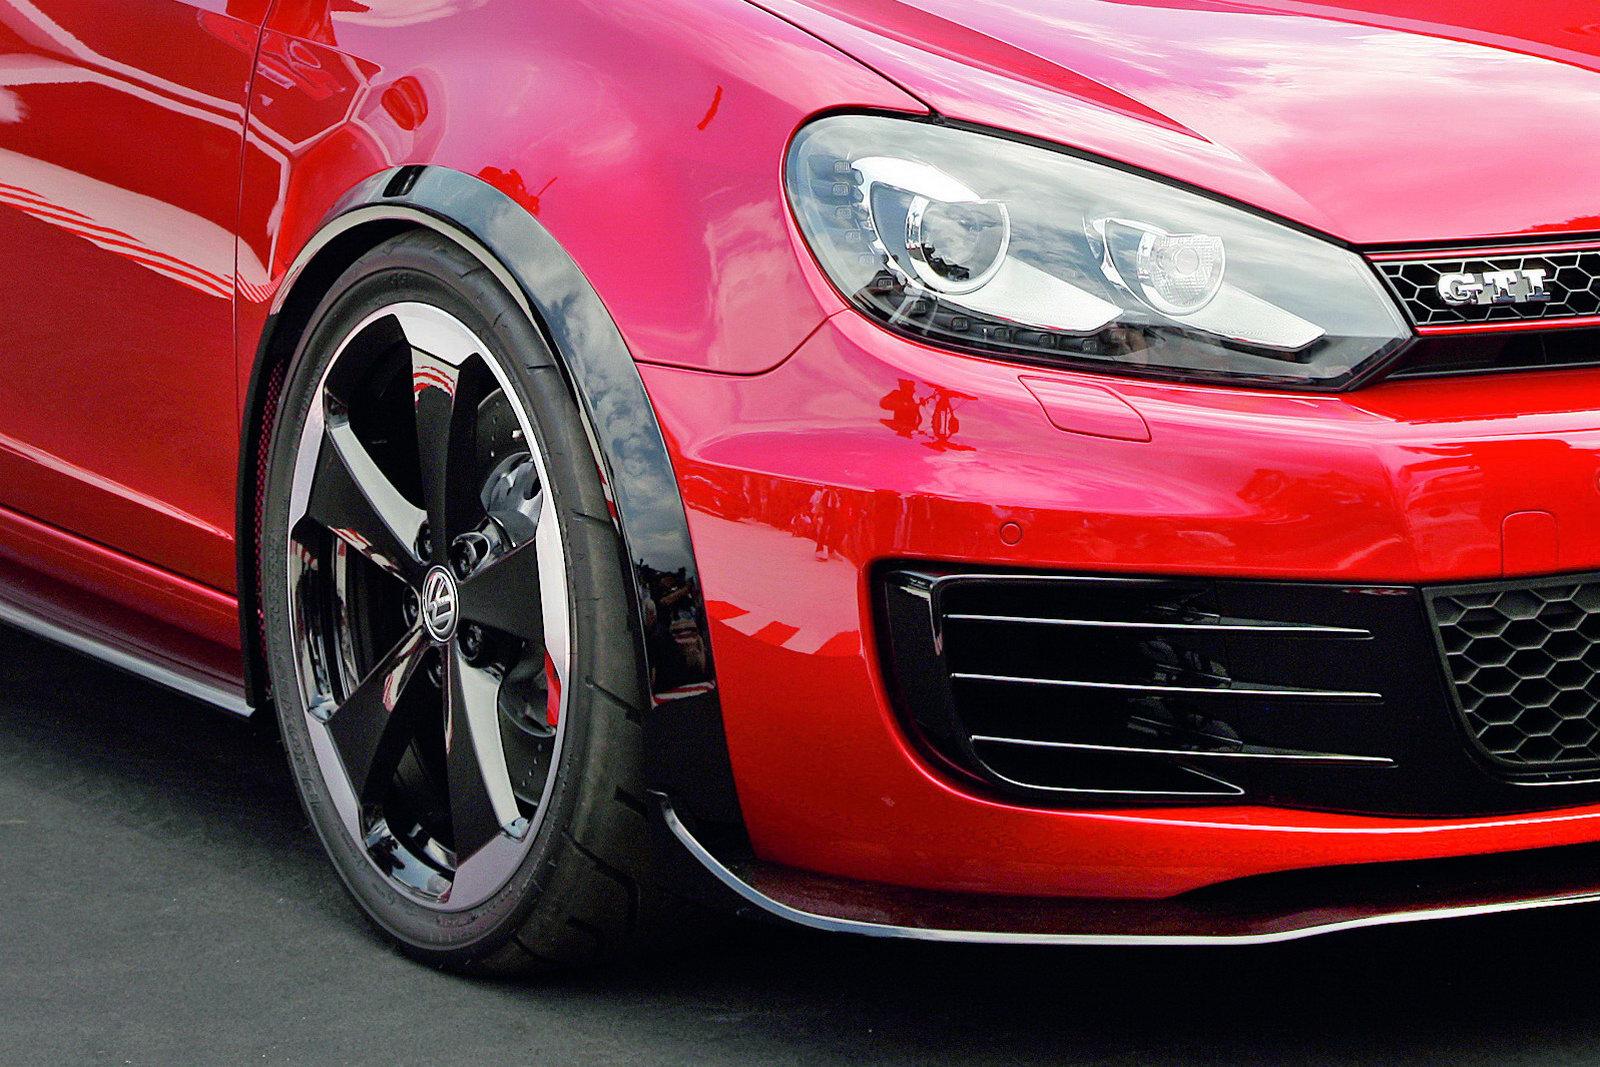 Volkswagen Golf GTI Cabrio - Auto Trends Magazine